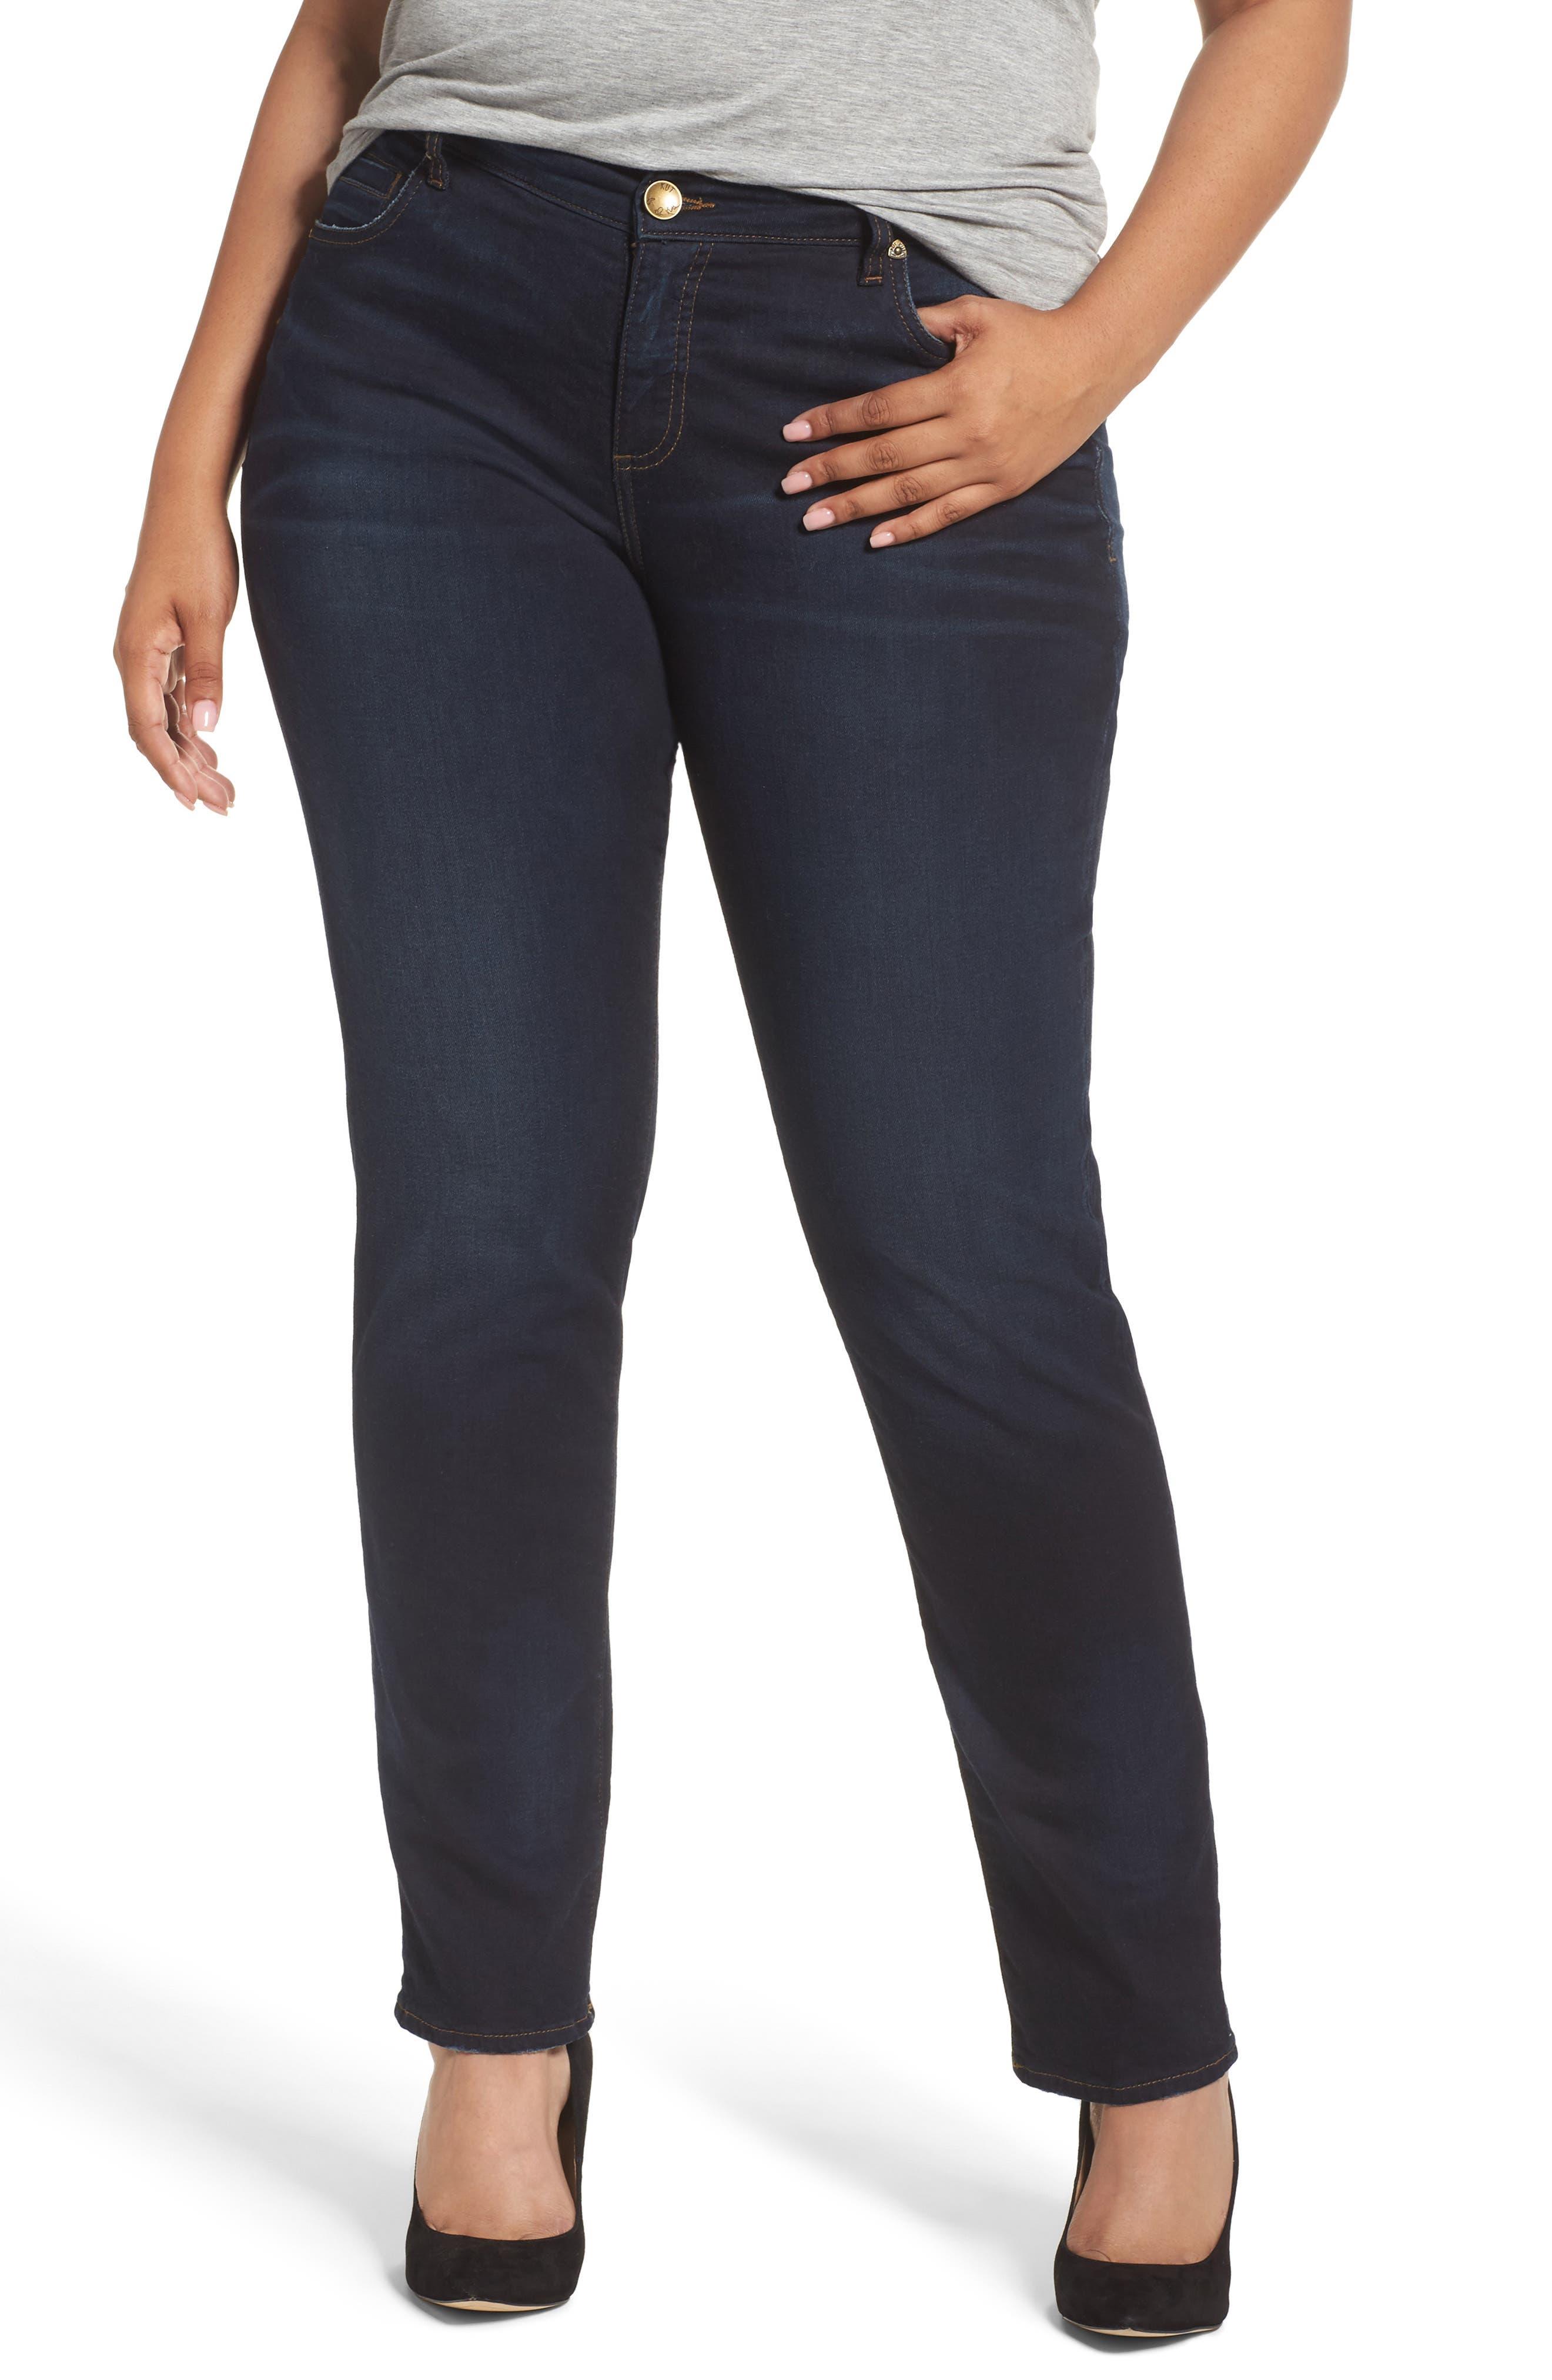 Diana Stretch Skinny Jeans,                         Main,                         color, Lionized